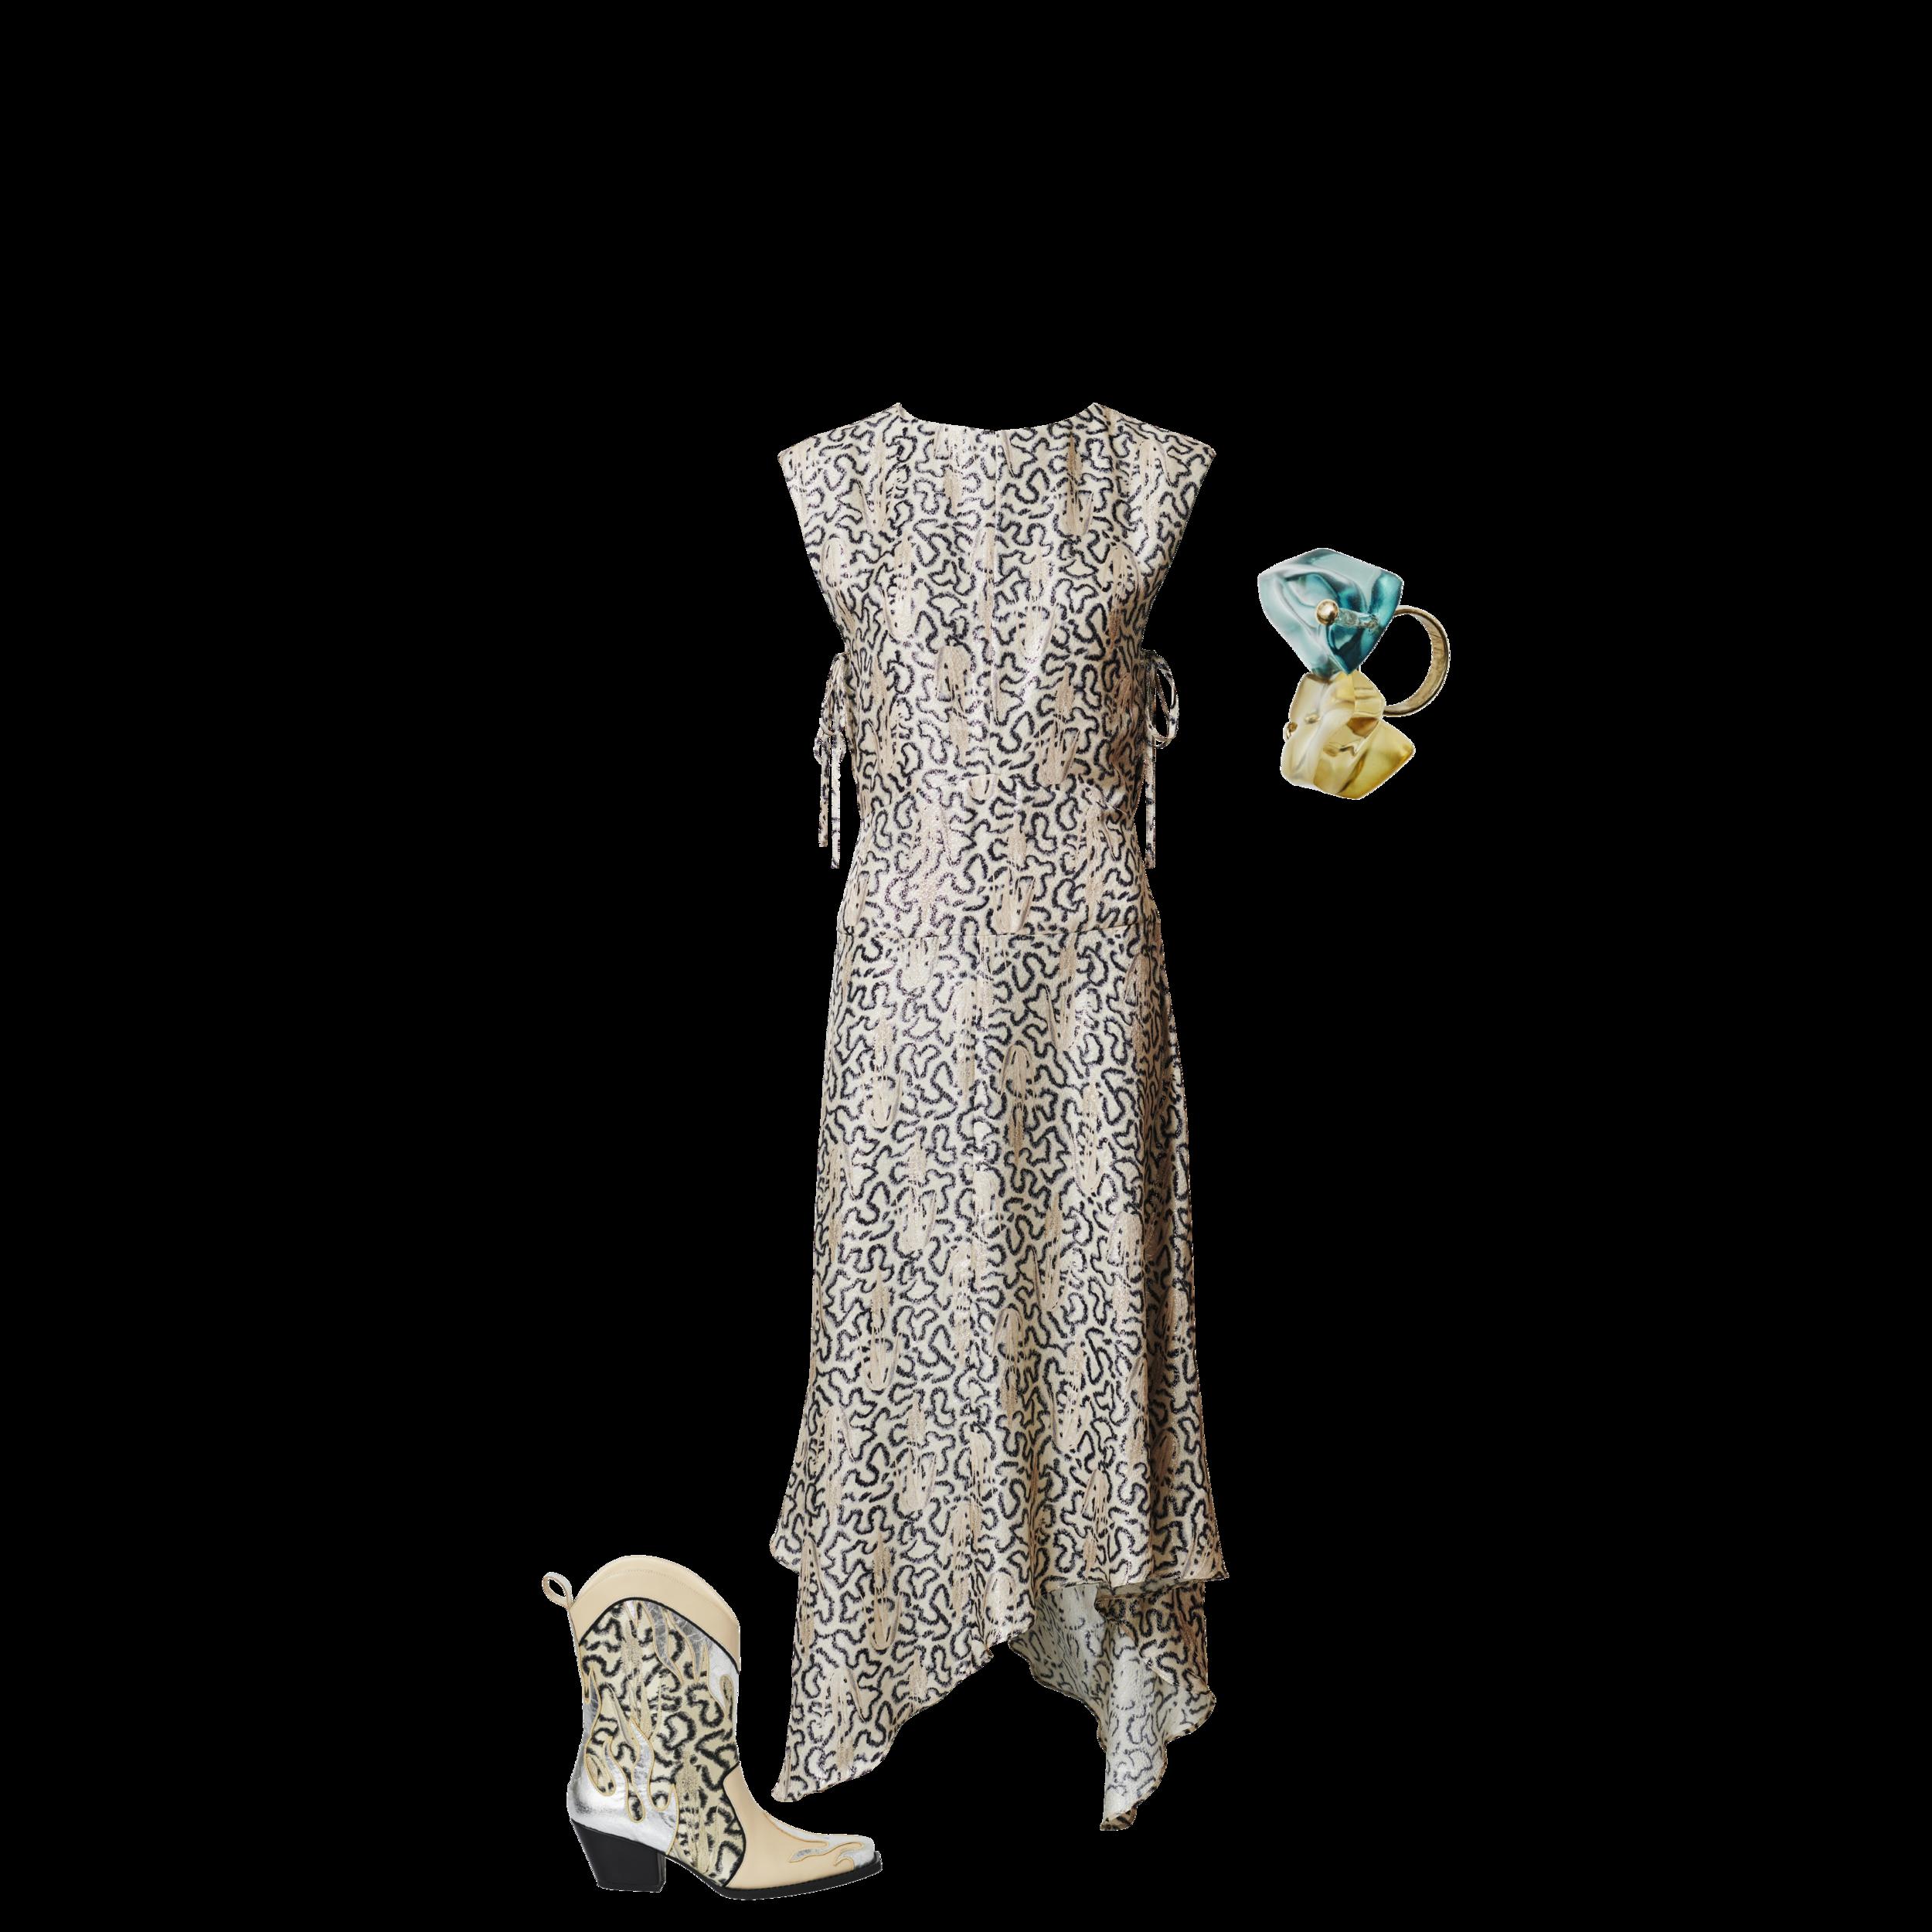 Ring - RM 84.95 Boots - RM 549.95 Metallic Dress - RM 469.95